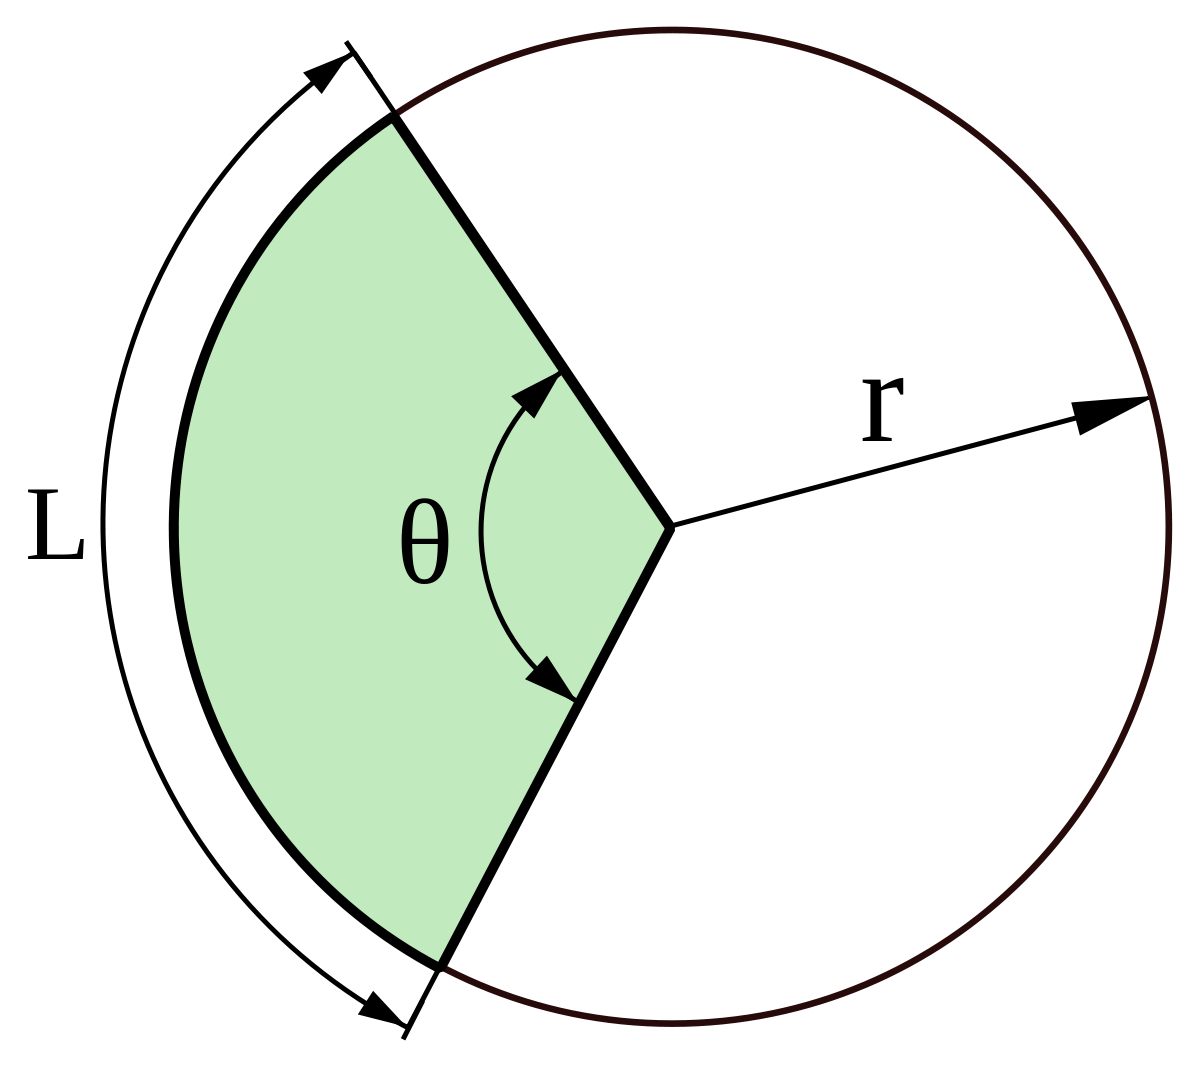 1200x1067 Circular Sector